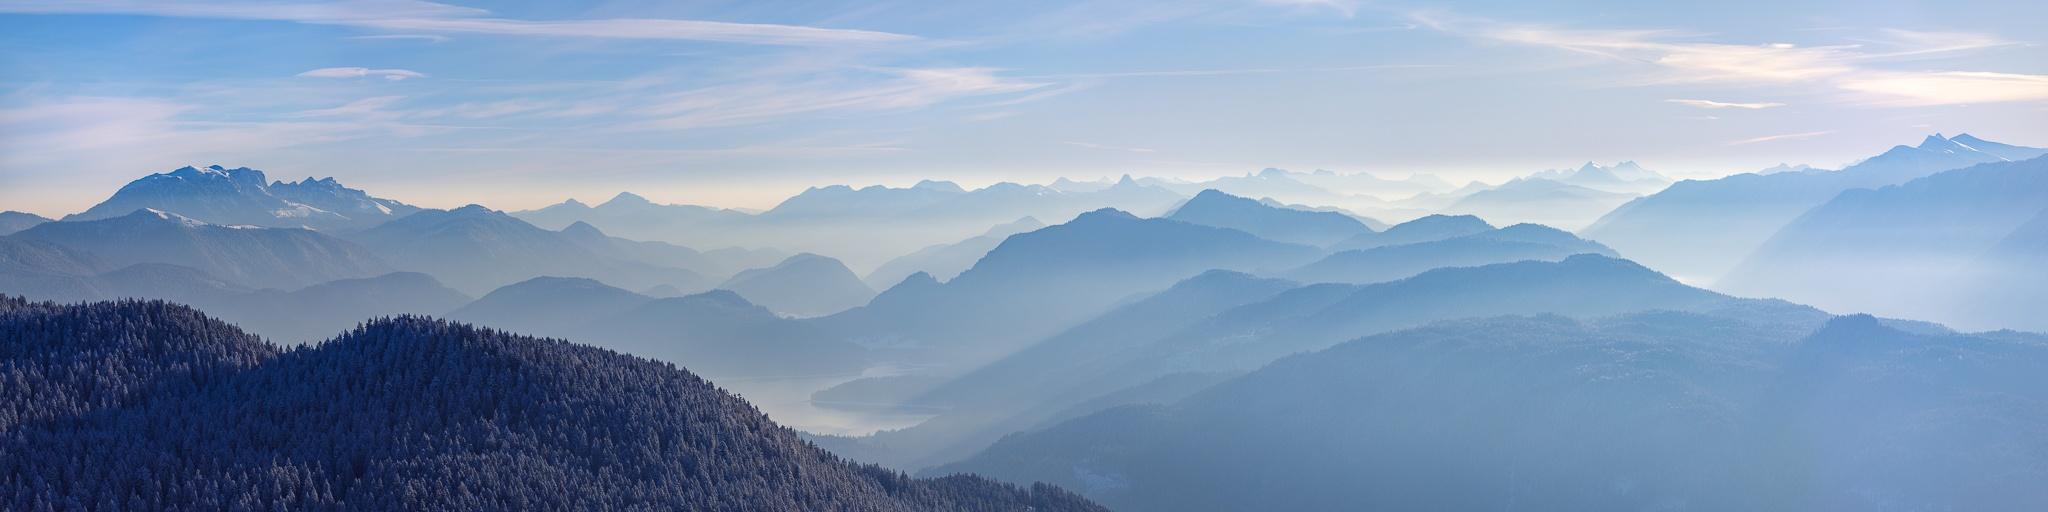 Walchensee, Berge, blaue, Panorama, Bergpanorama